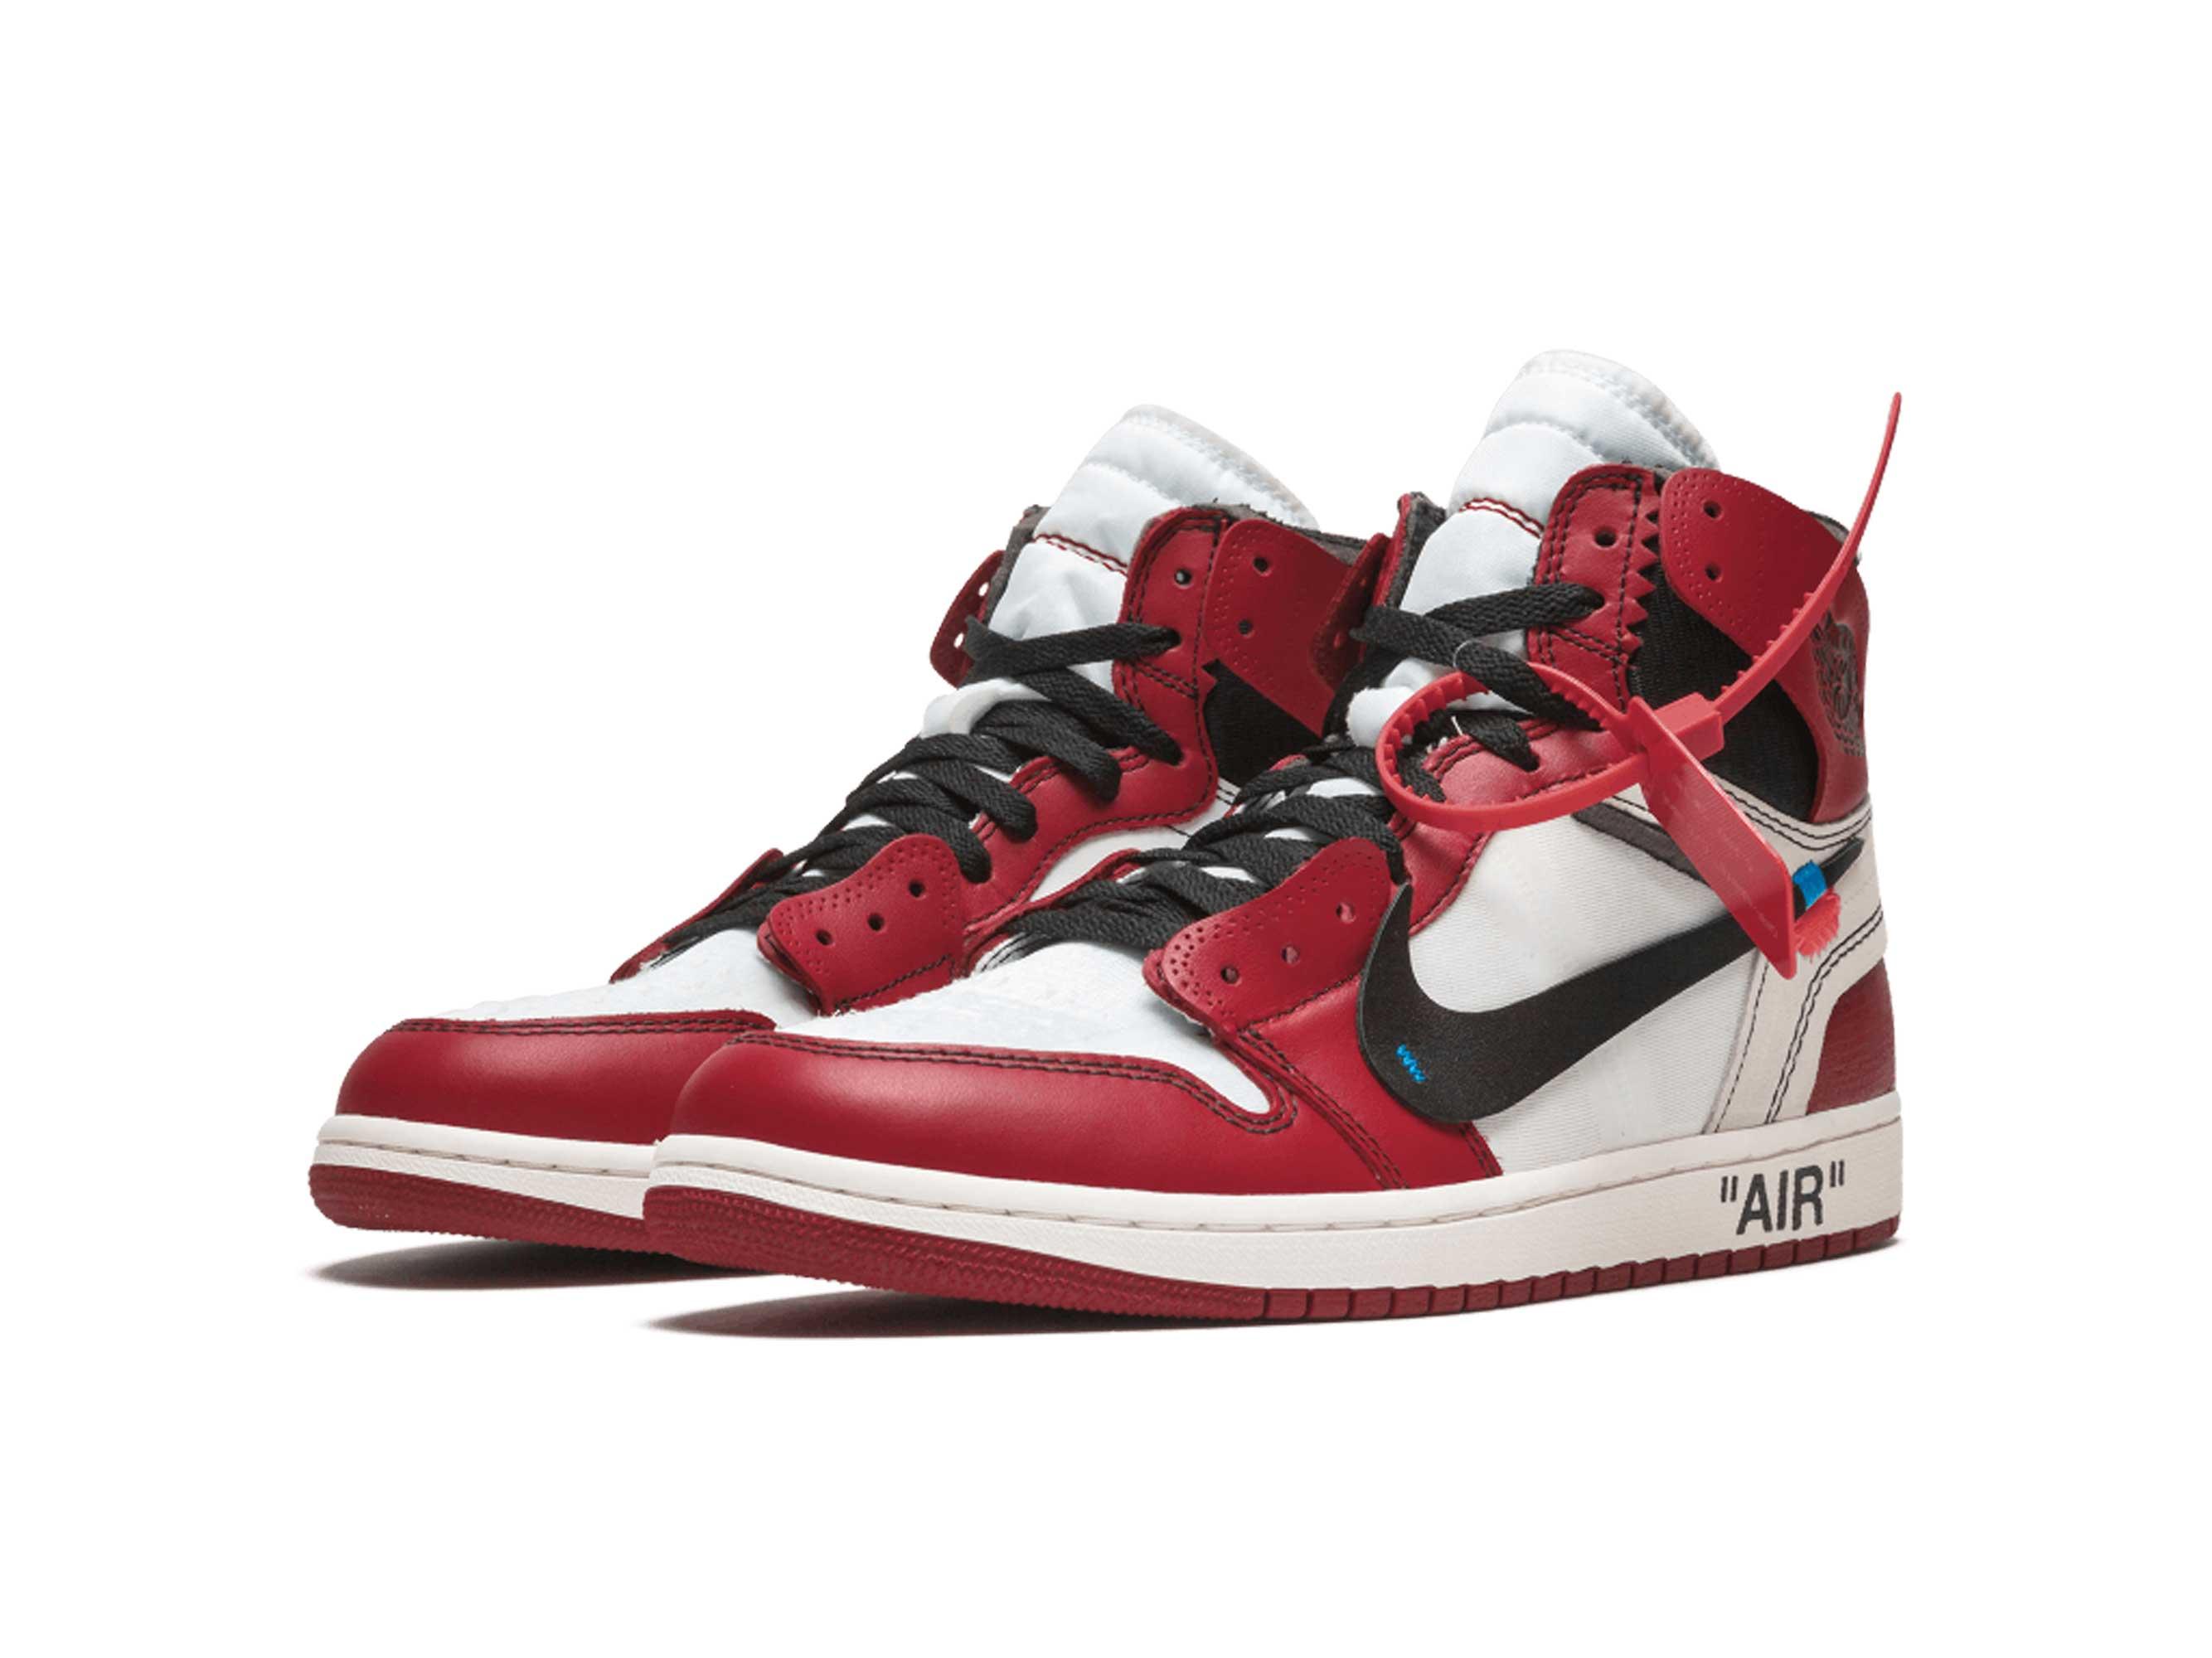 nike air Jordan 1 x off white the 10 red white aa3834_101 купить